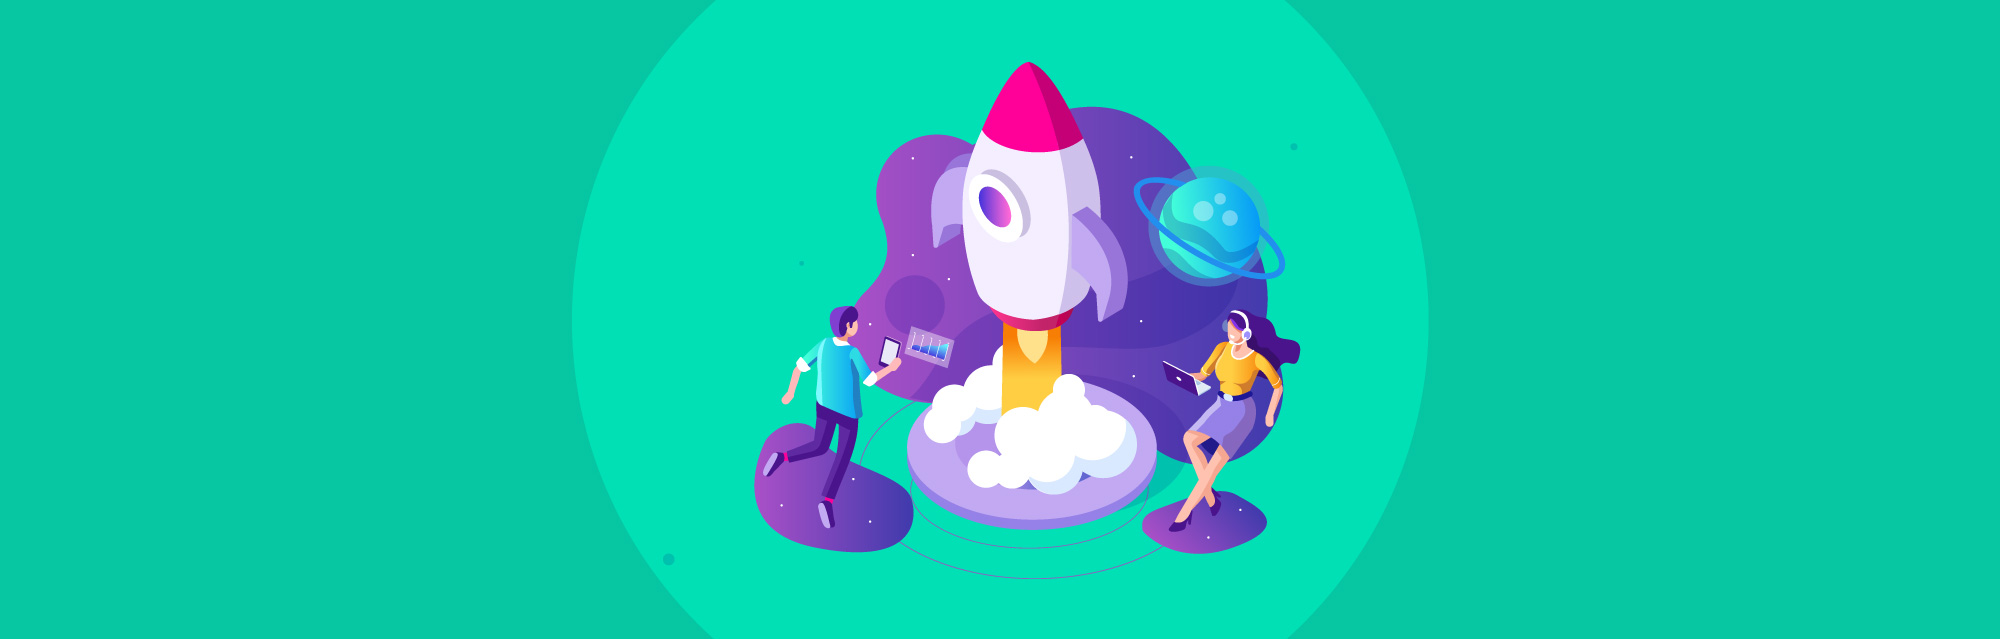 Roketto_Blog_SaaStips-startups